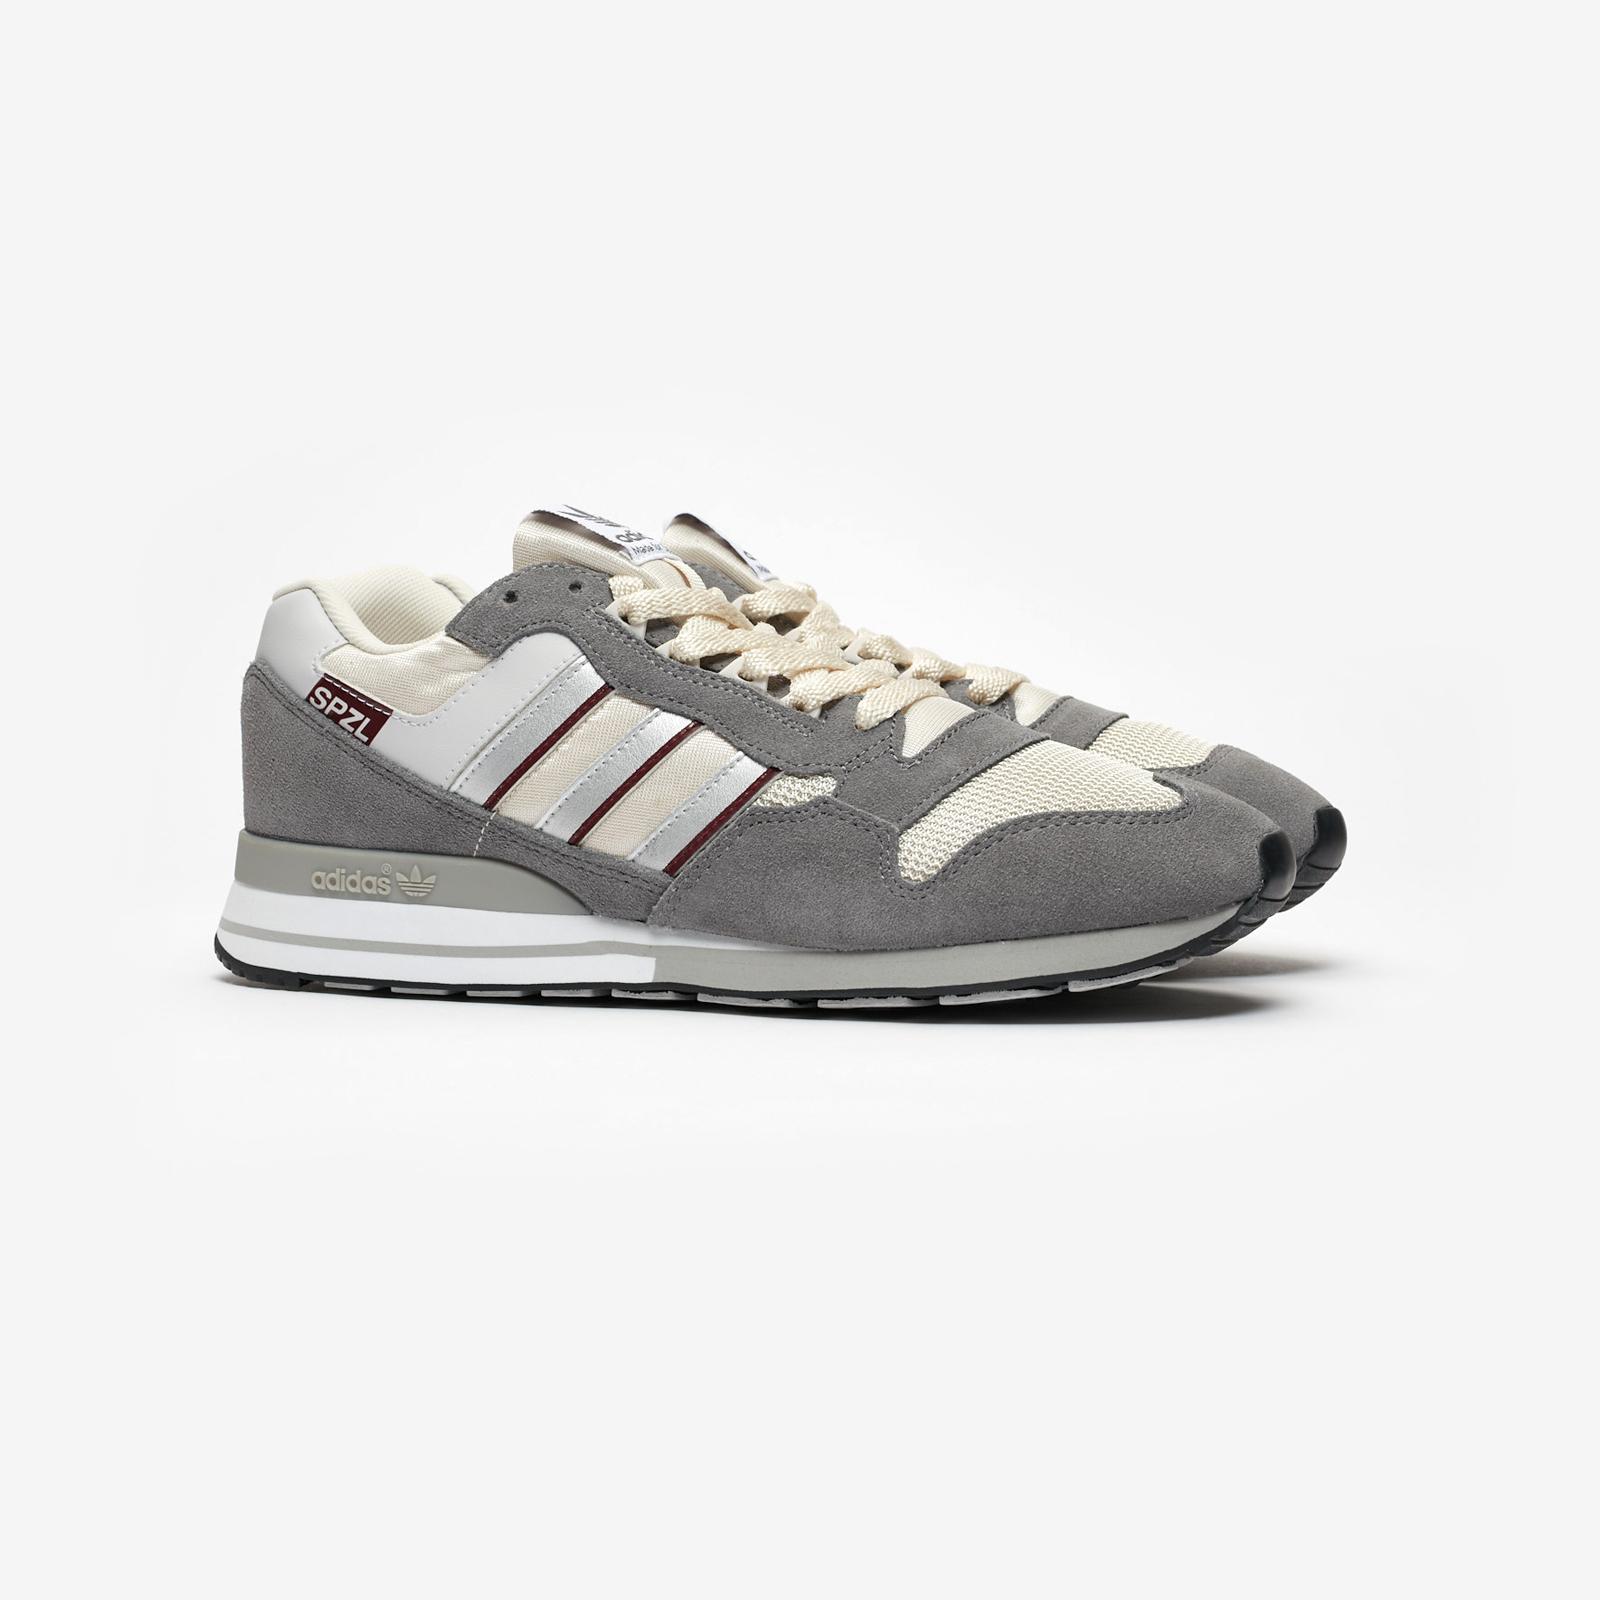 30489bdb7 adidas ZX530 - F35718 - Sneakersnstuff